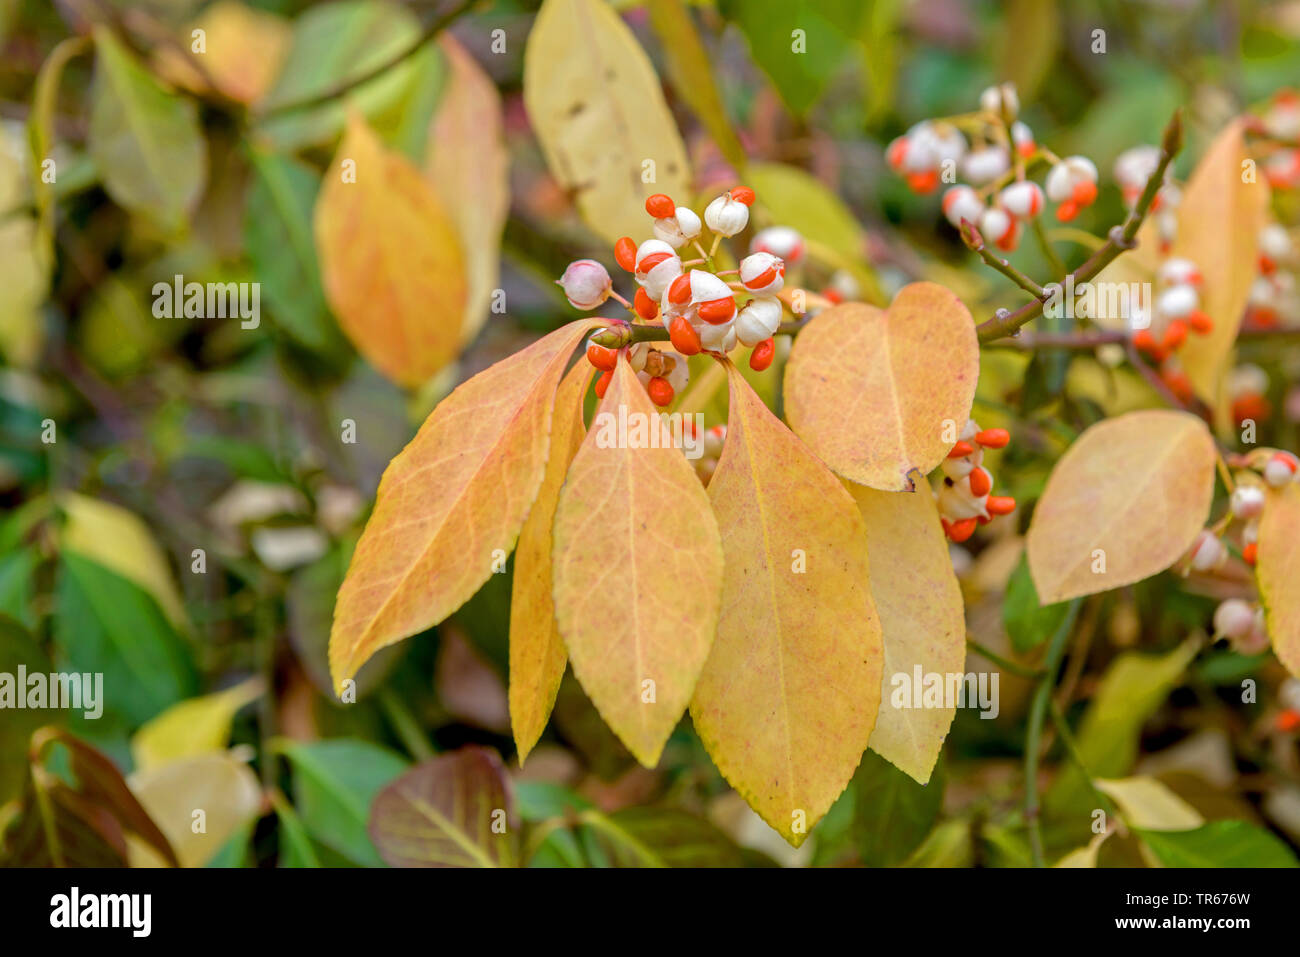 climbing euonymus, wintercreeper euonymus, winter-creeper (Euonymus fortunei 'Vegetus', Euonymus fortunei Vegetus), fruiting, cultivar Vegetus, Germany - Stock Image